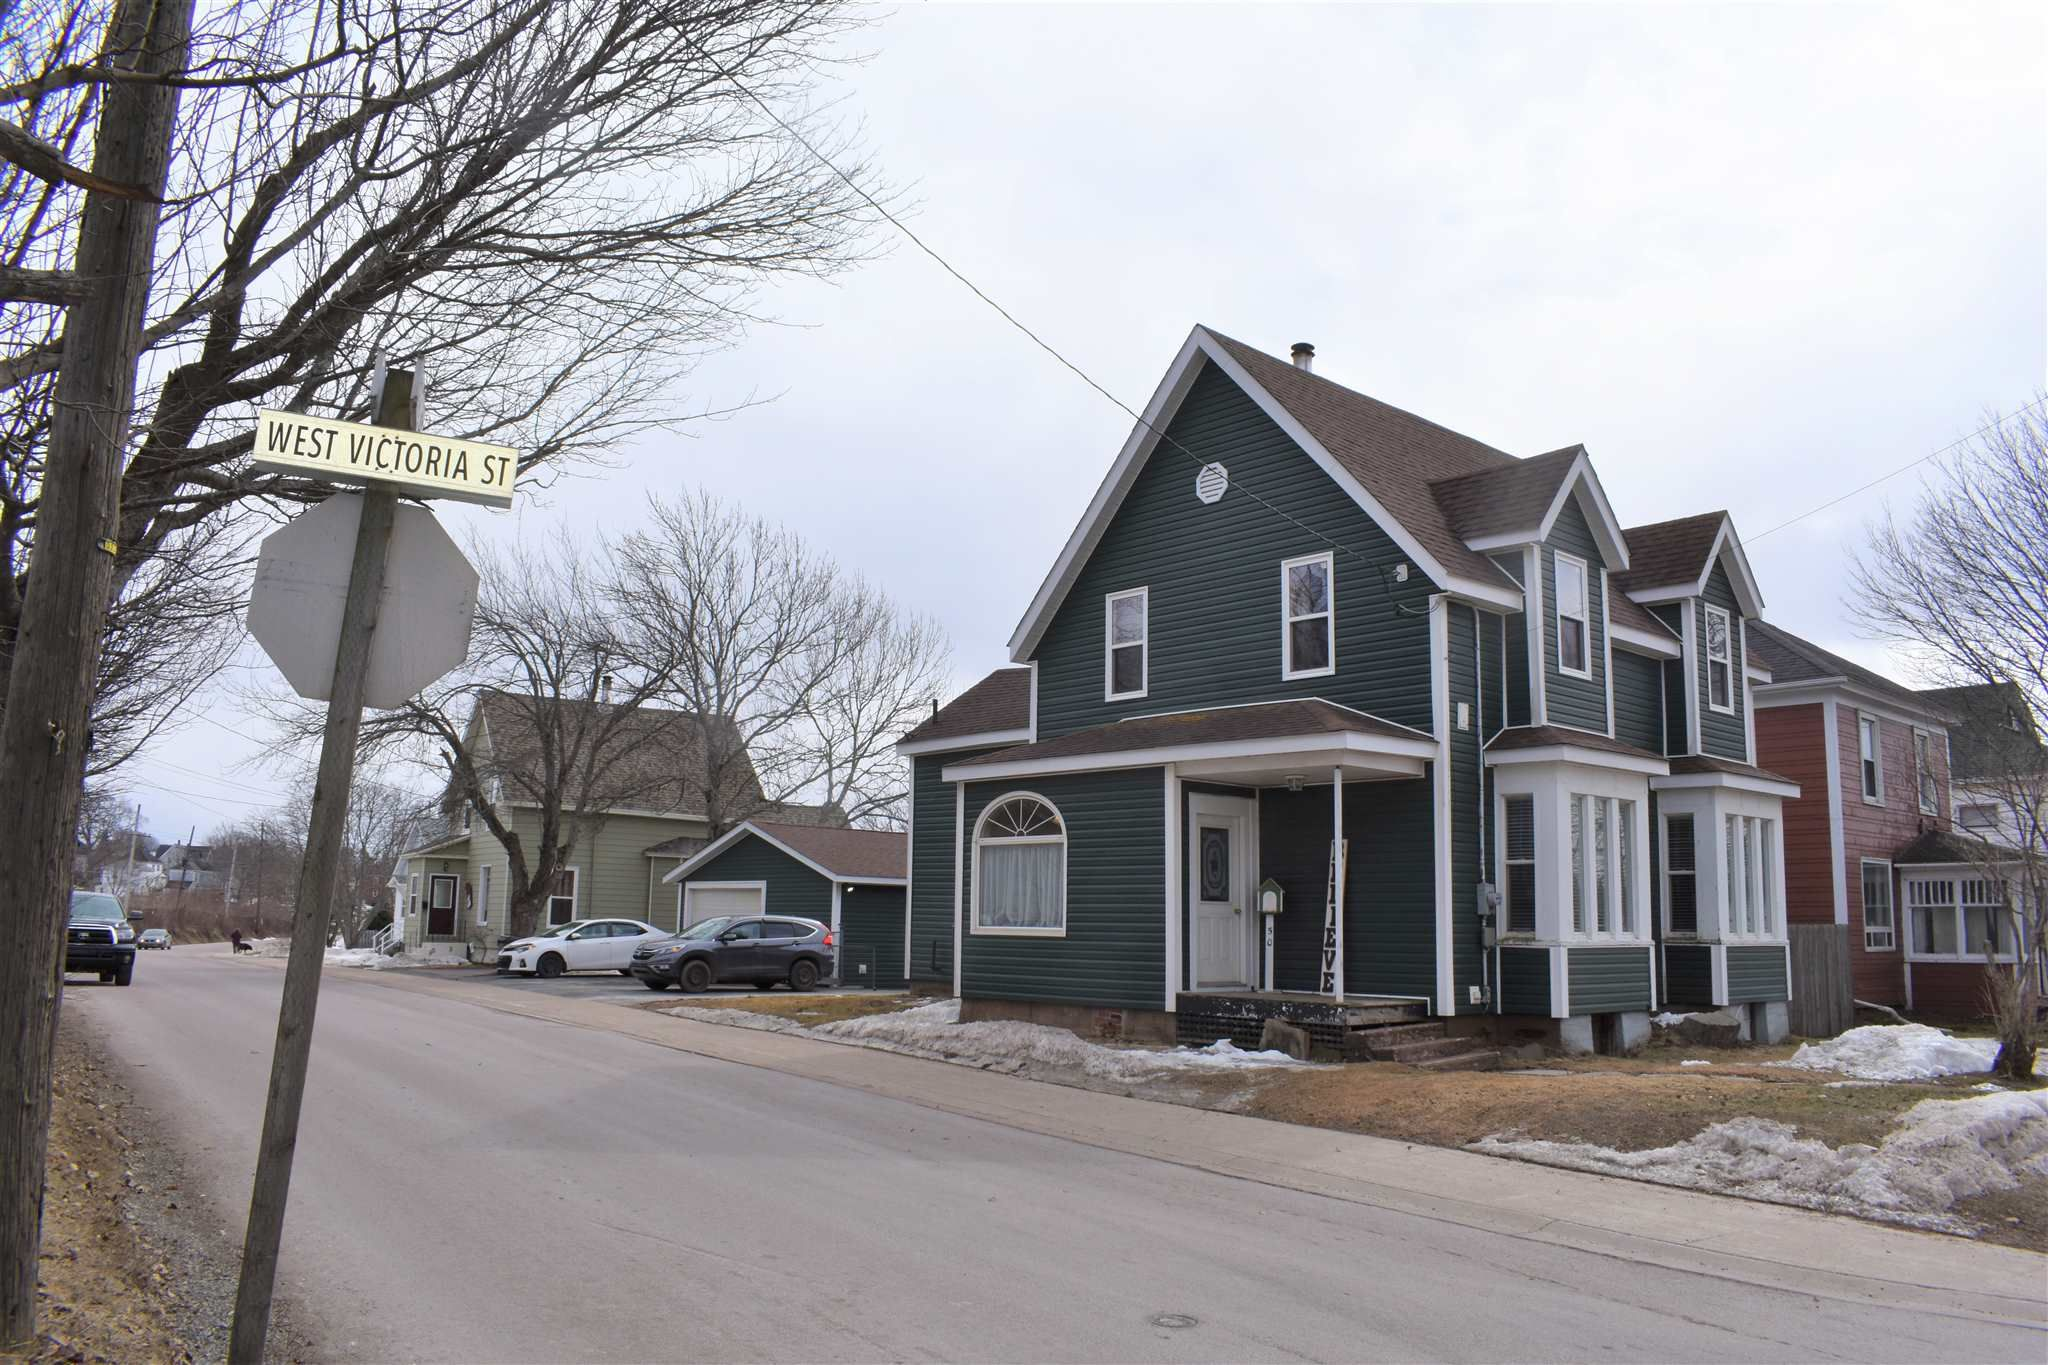 Main Photo: 50 West Victoria Street in Amherst: 101-Amherst,Brookdale,Warren Residential for sale (Northern Region)  : MLS®# 202104913